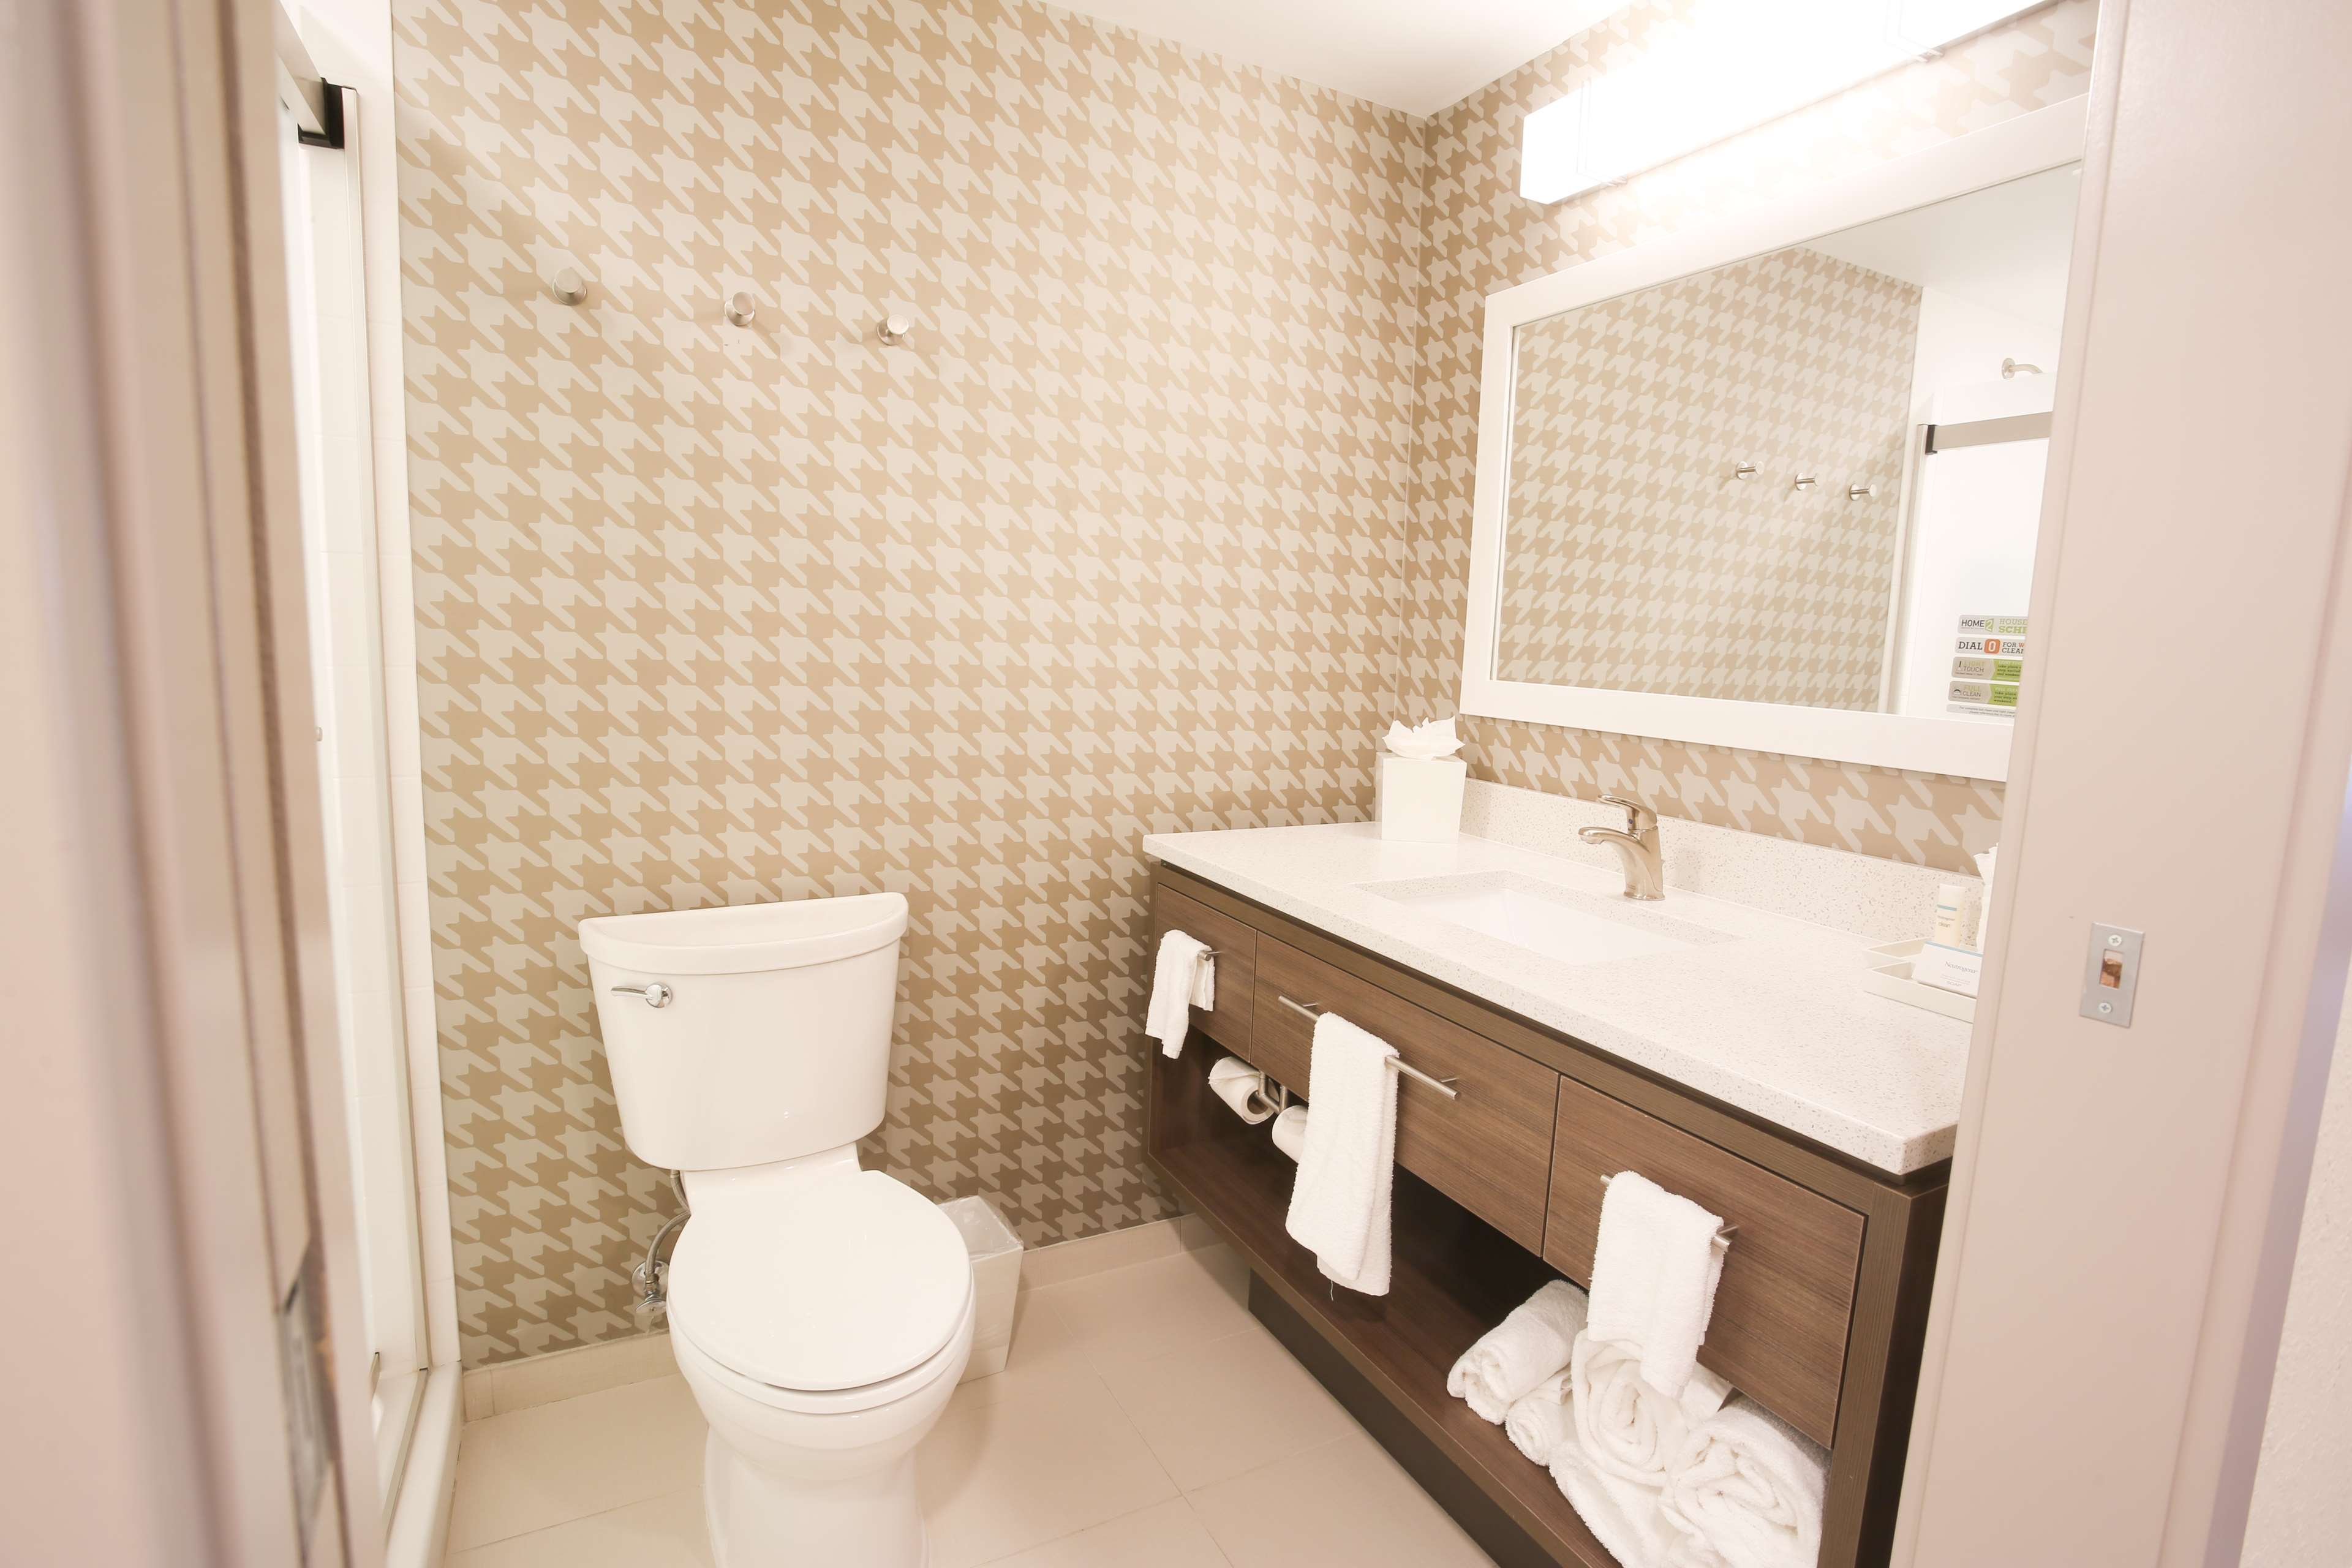 Home2 Suites by Hilton Bordentown image 31